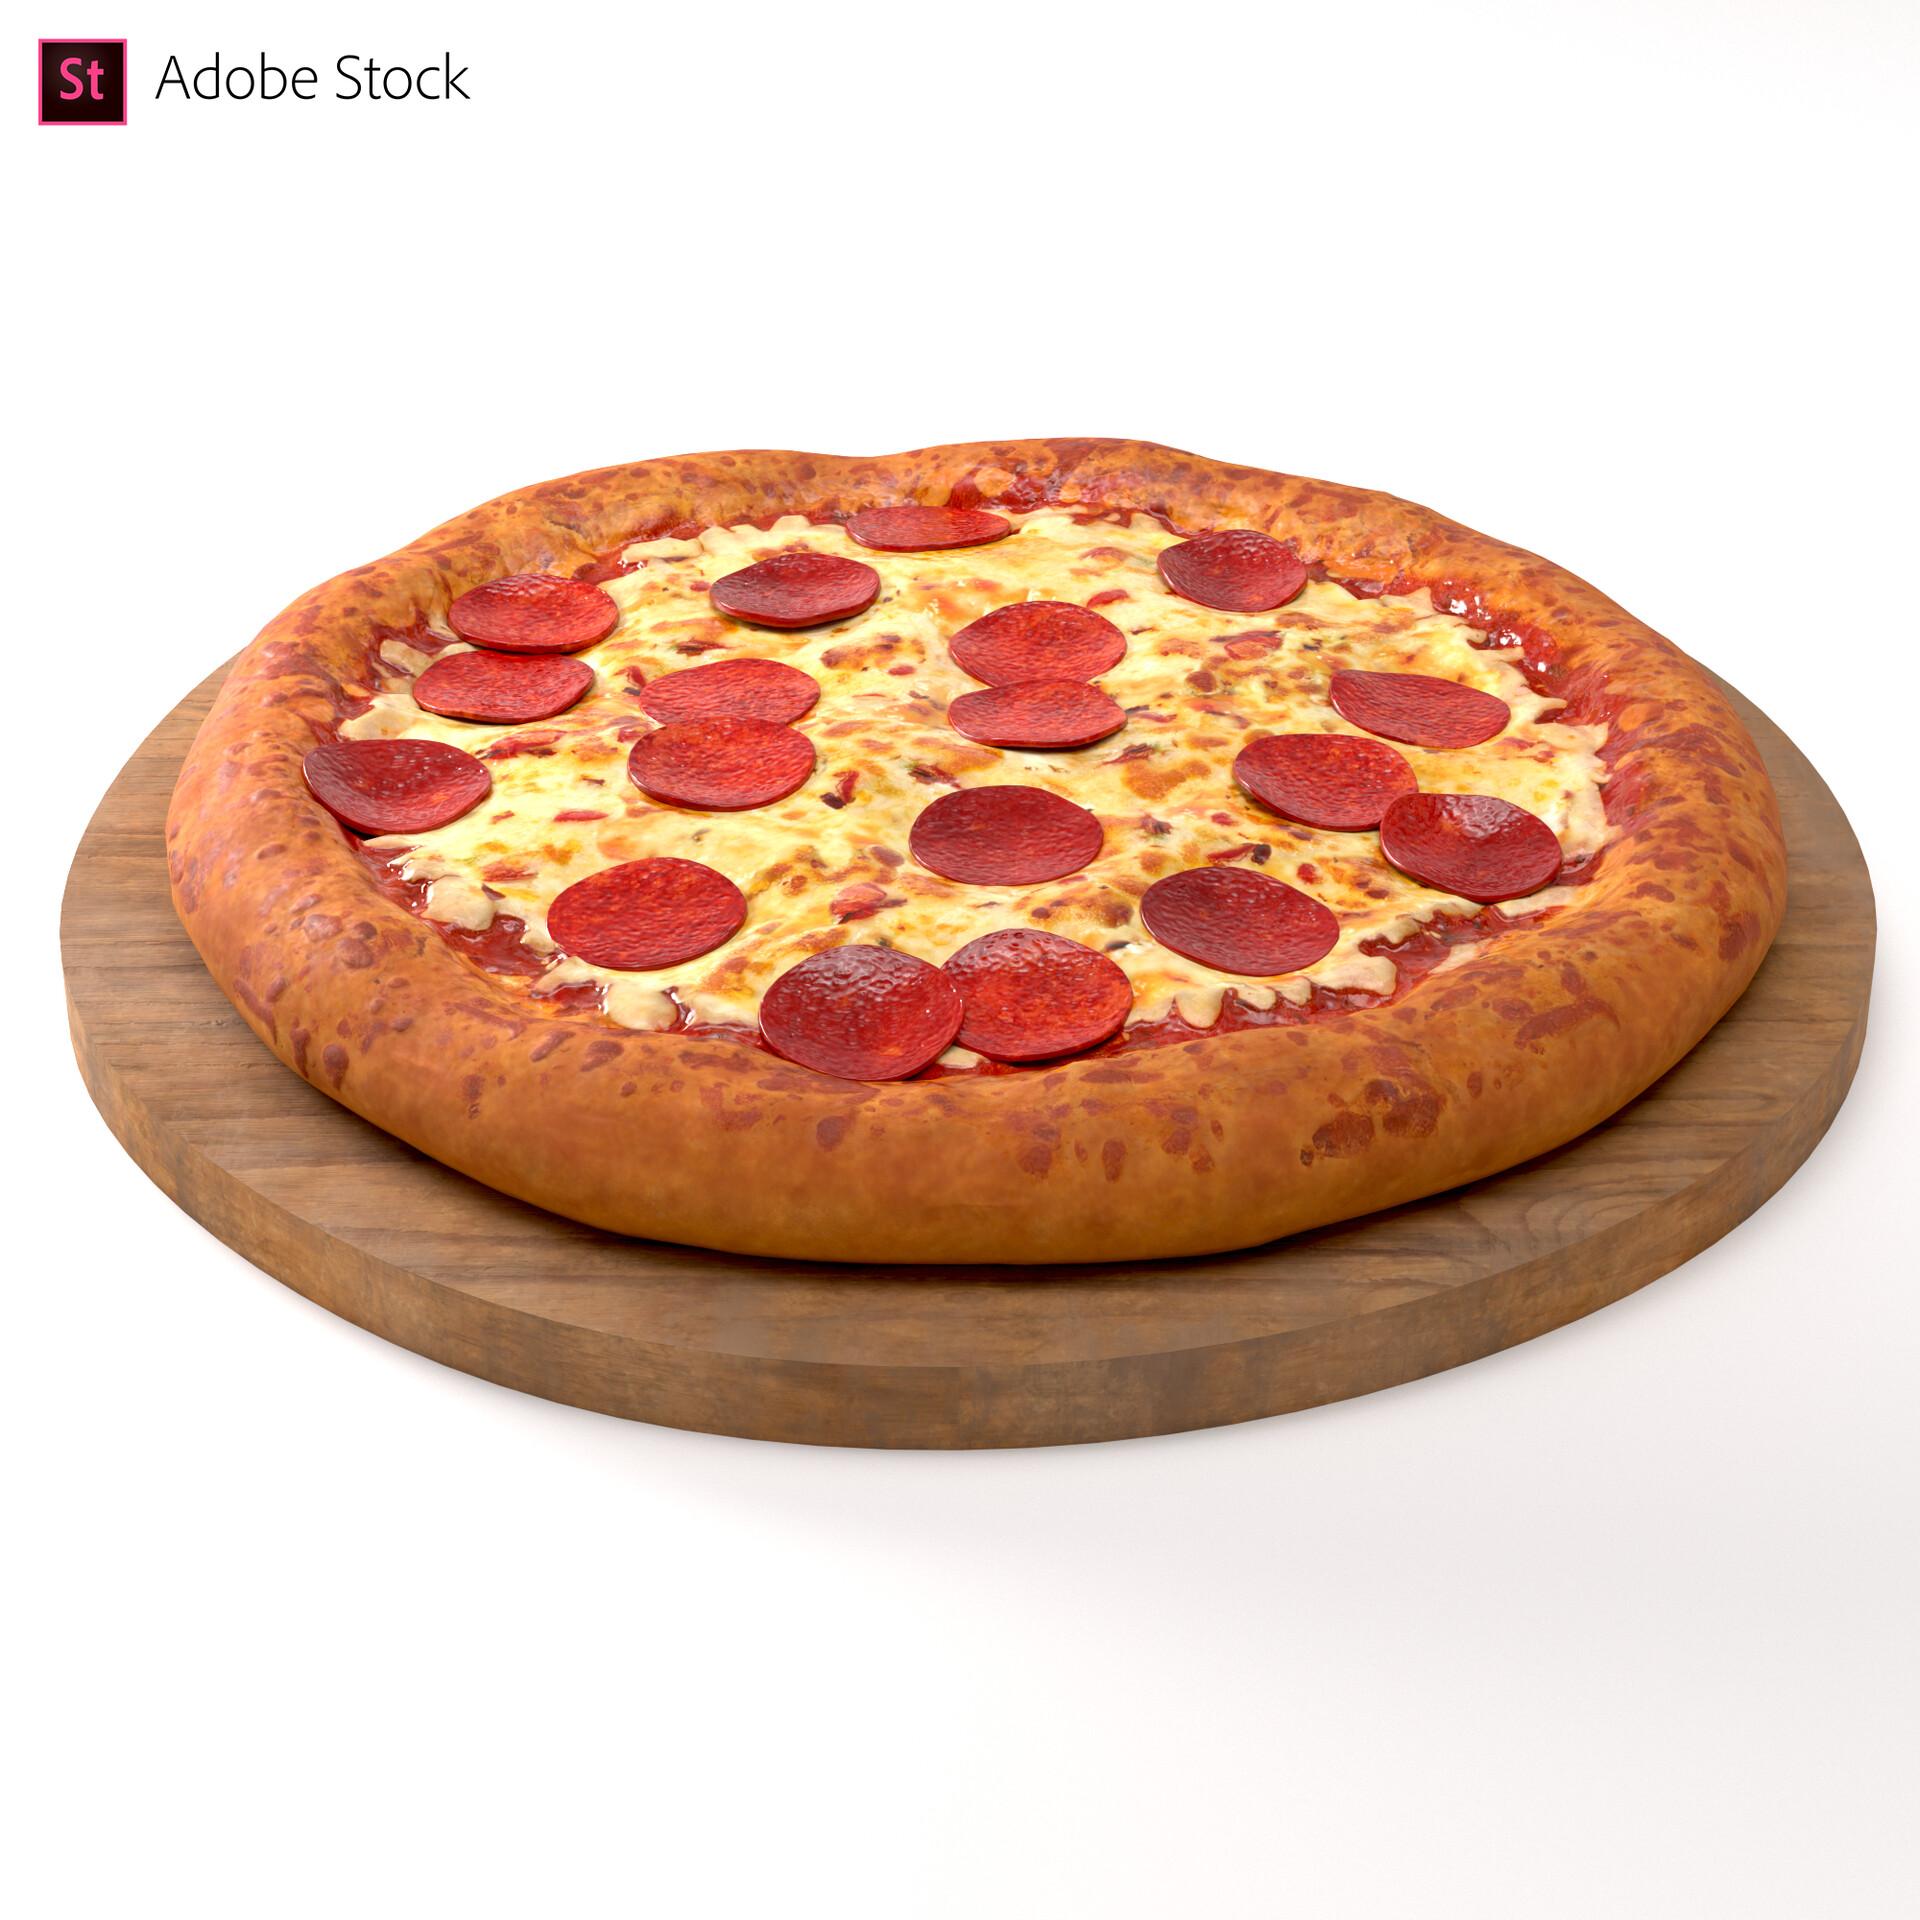 Jesus bibian jr pepperonipizza preview